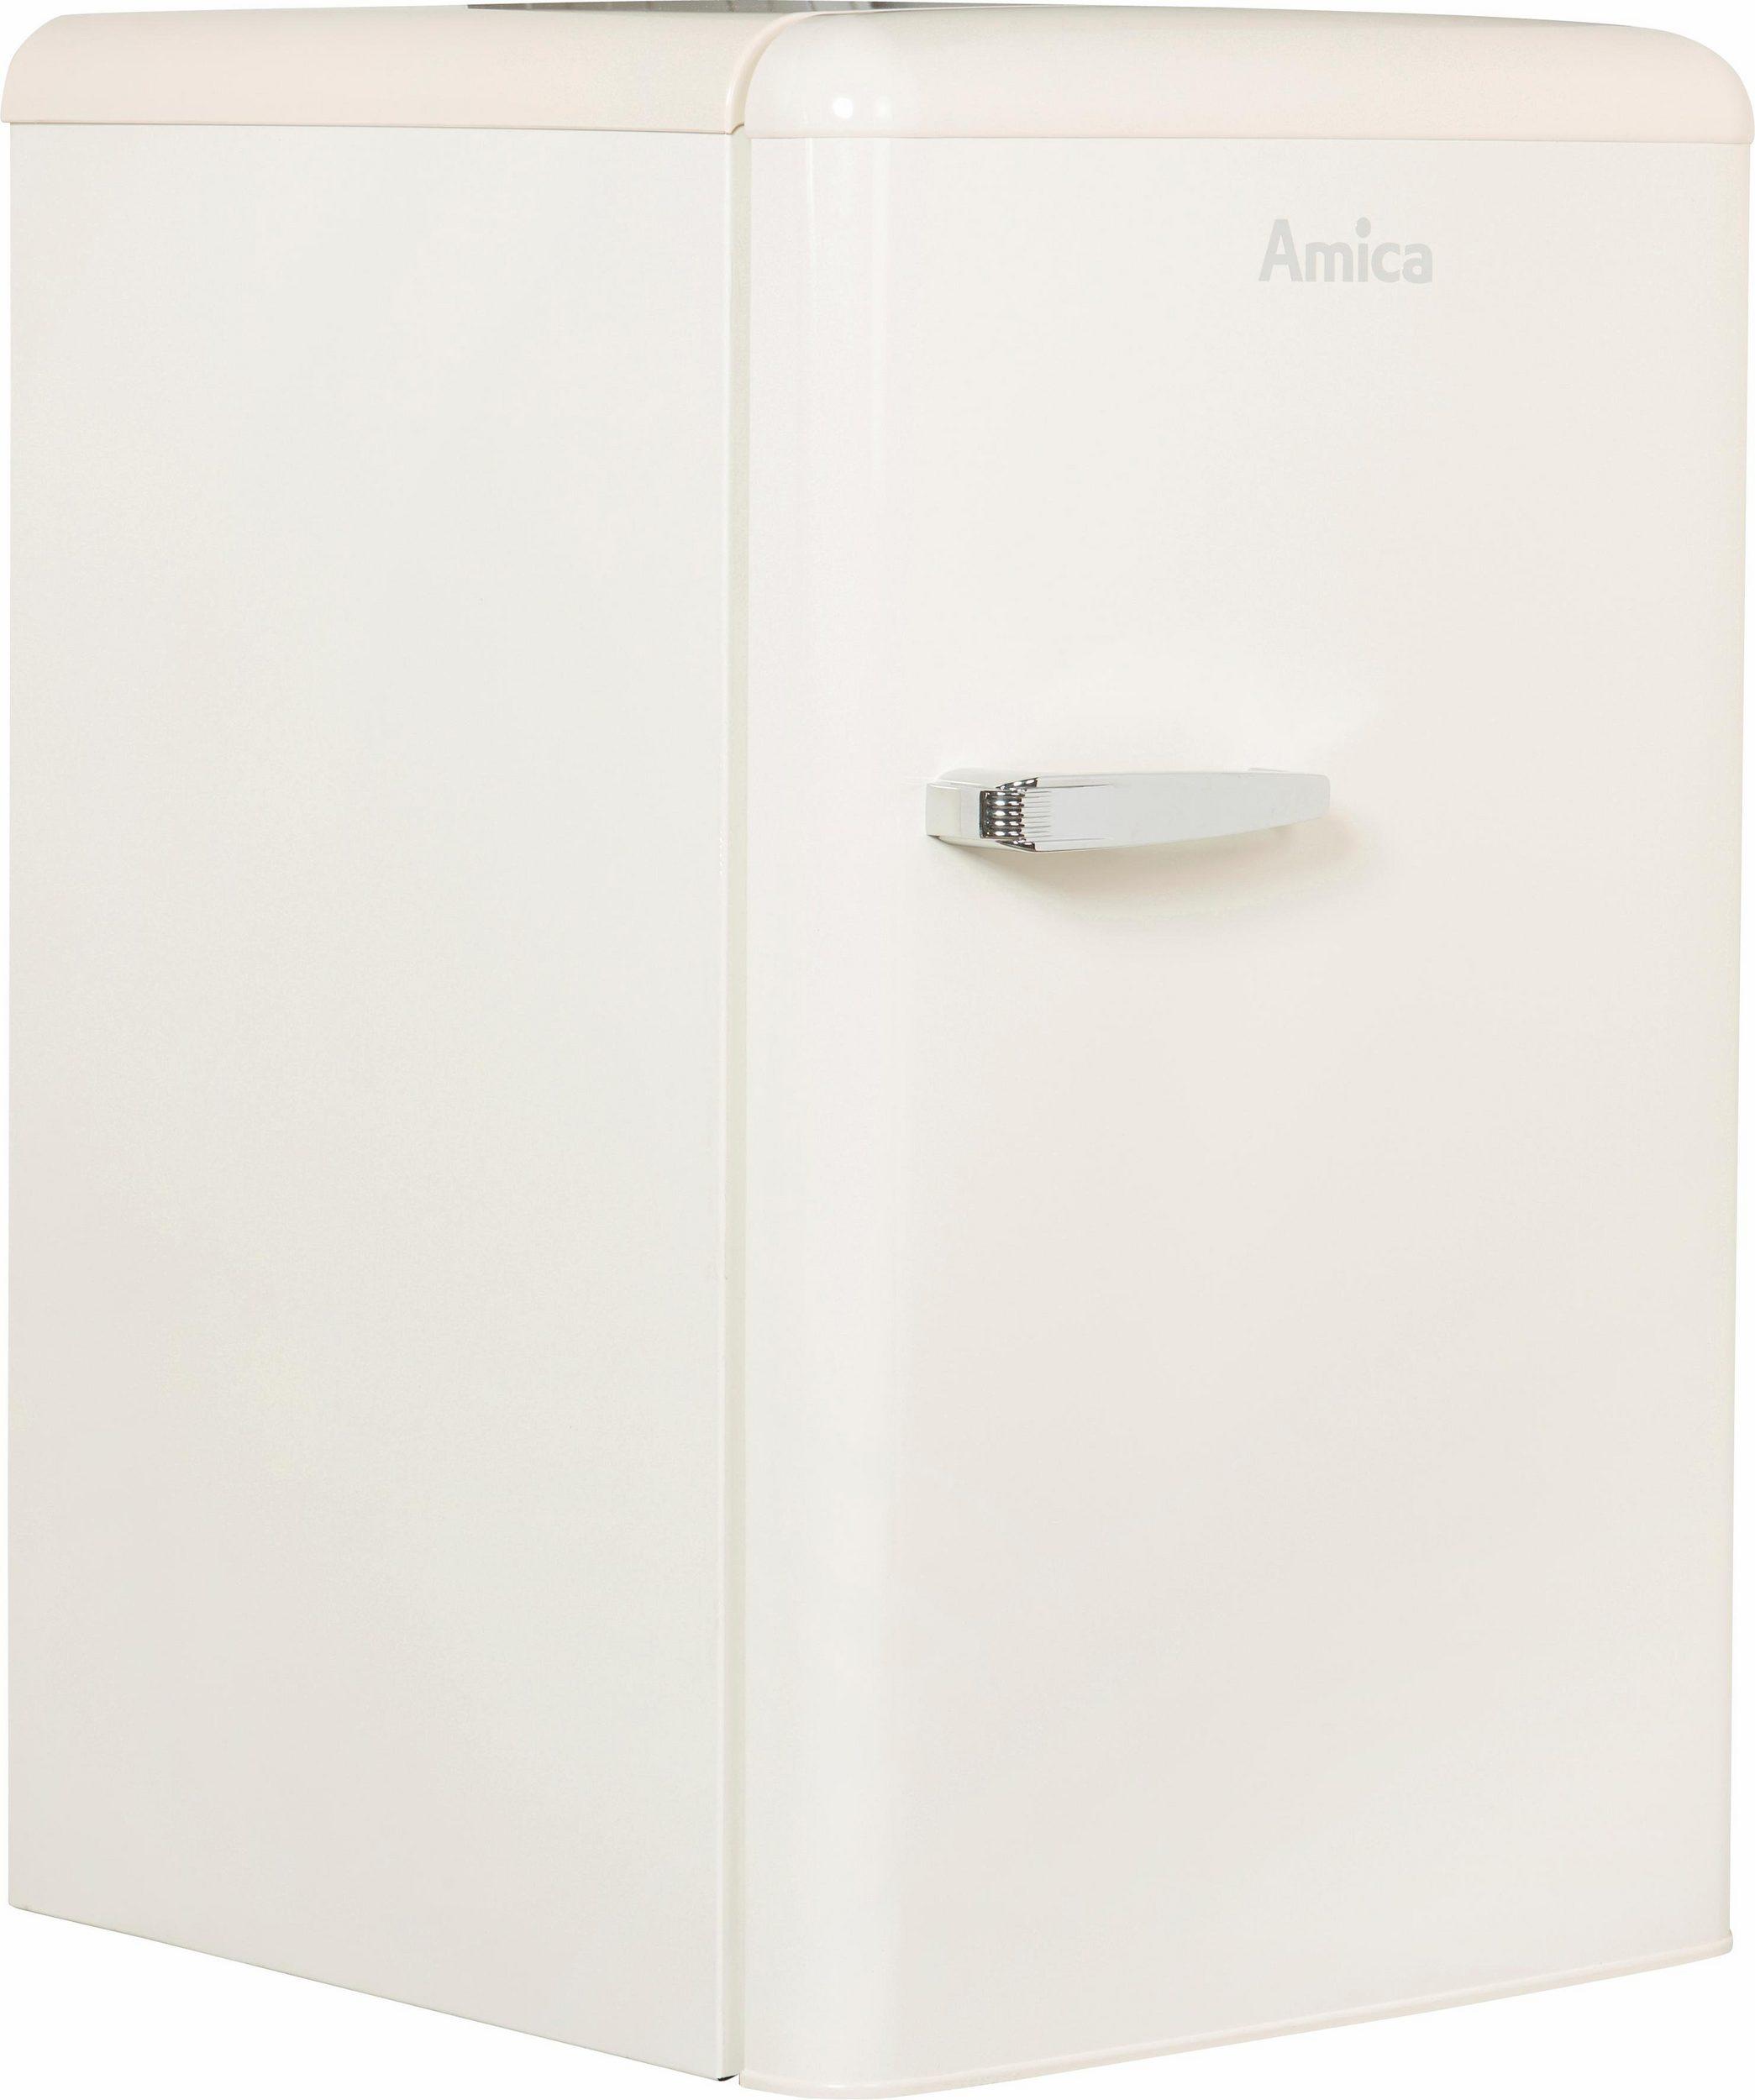 Table Top Kühlschrank KS 15615B von Amica